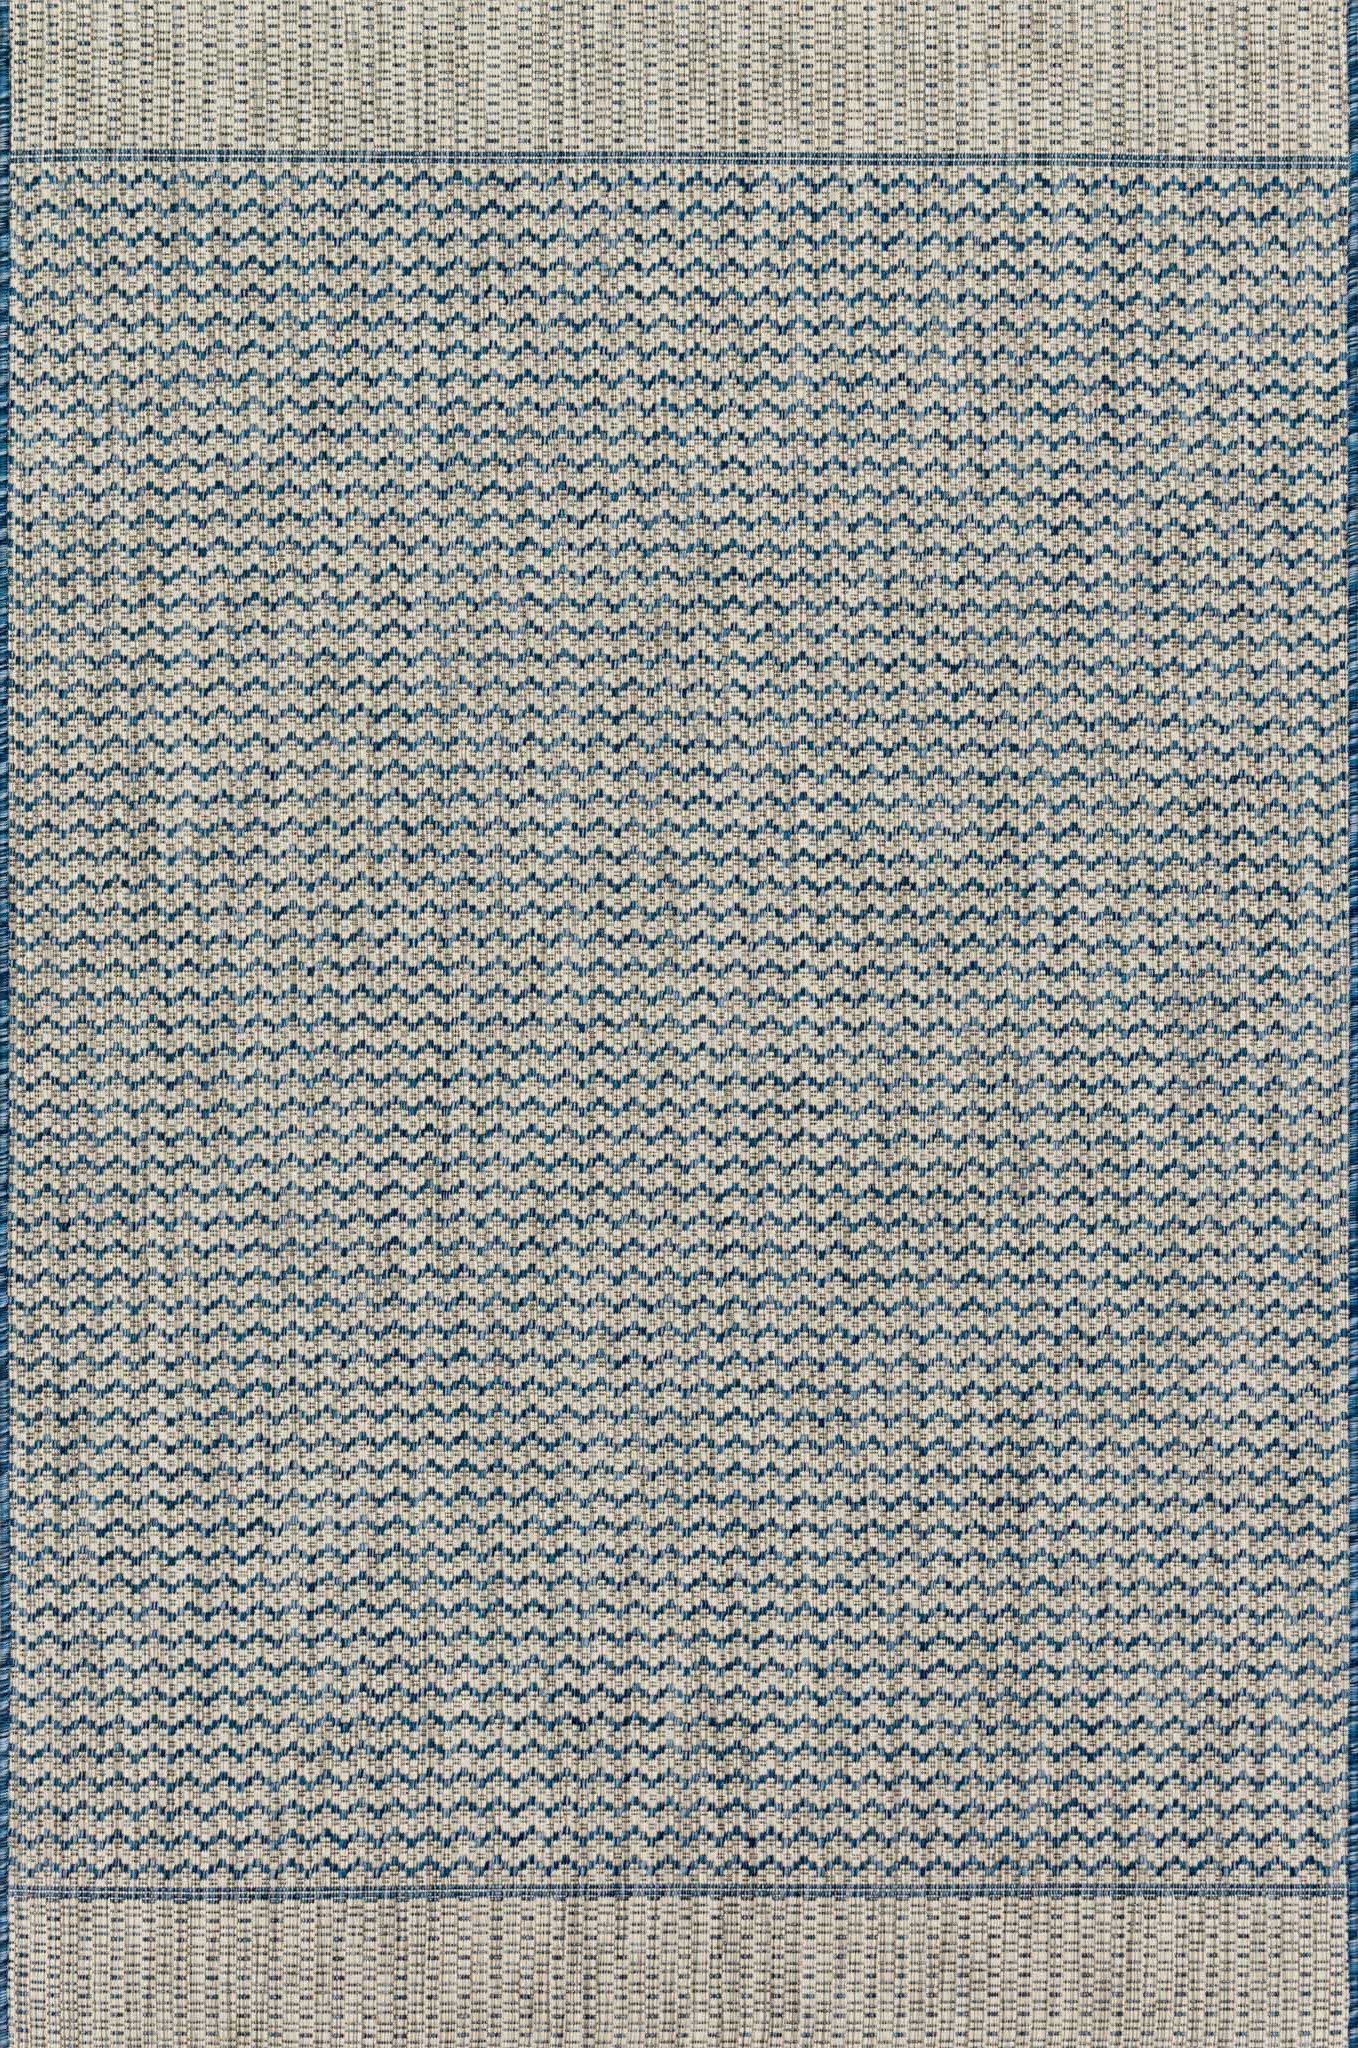 YARD rug ISLE03GYBL face